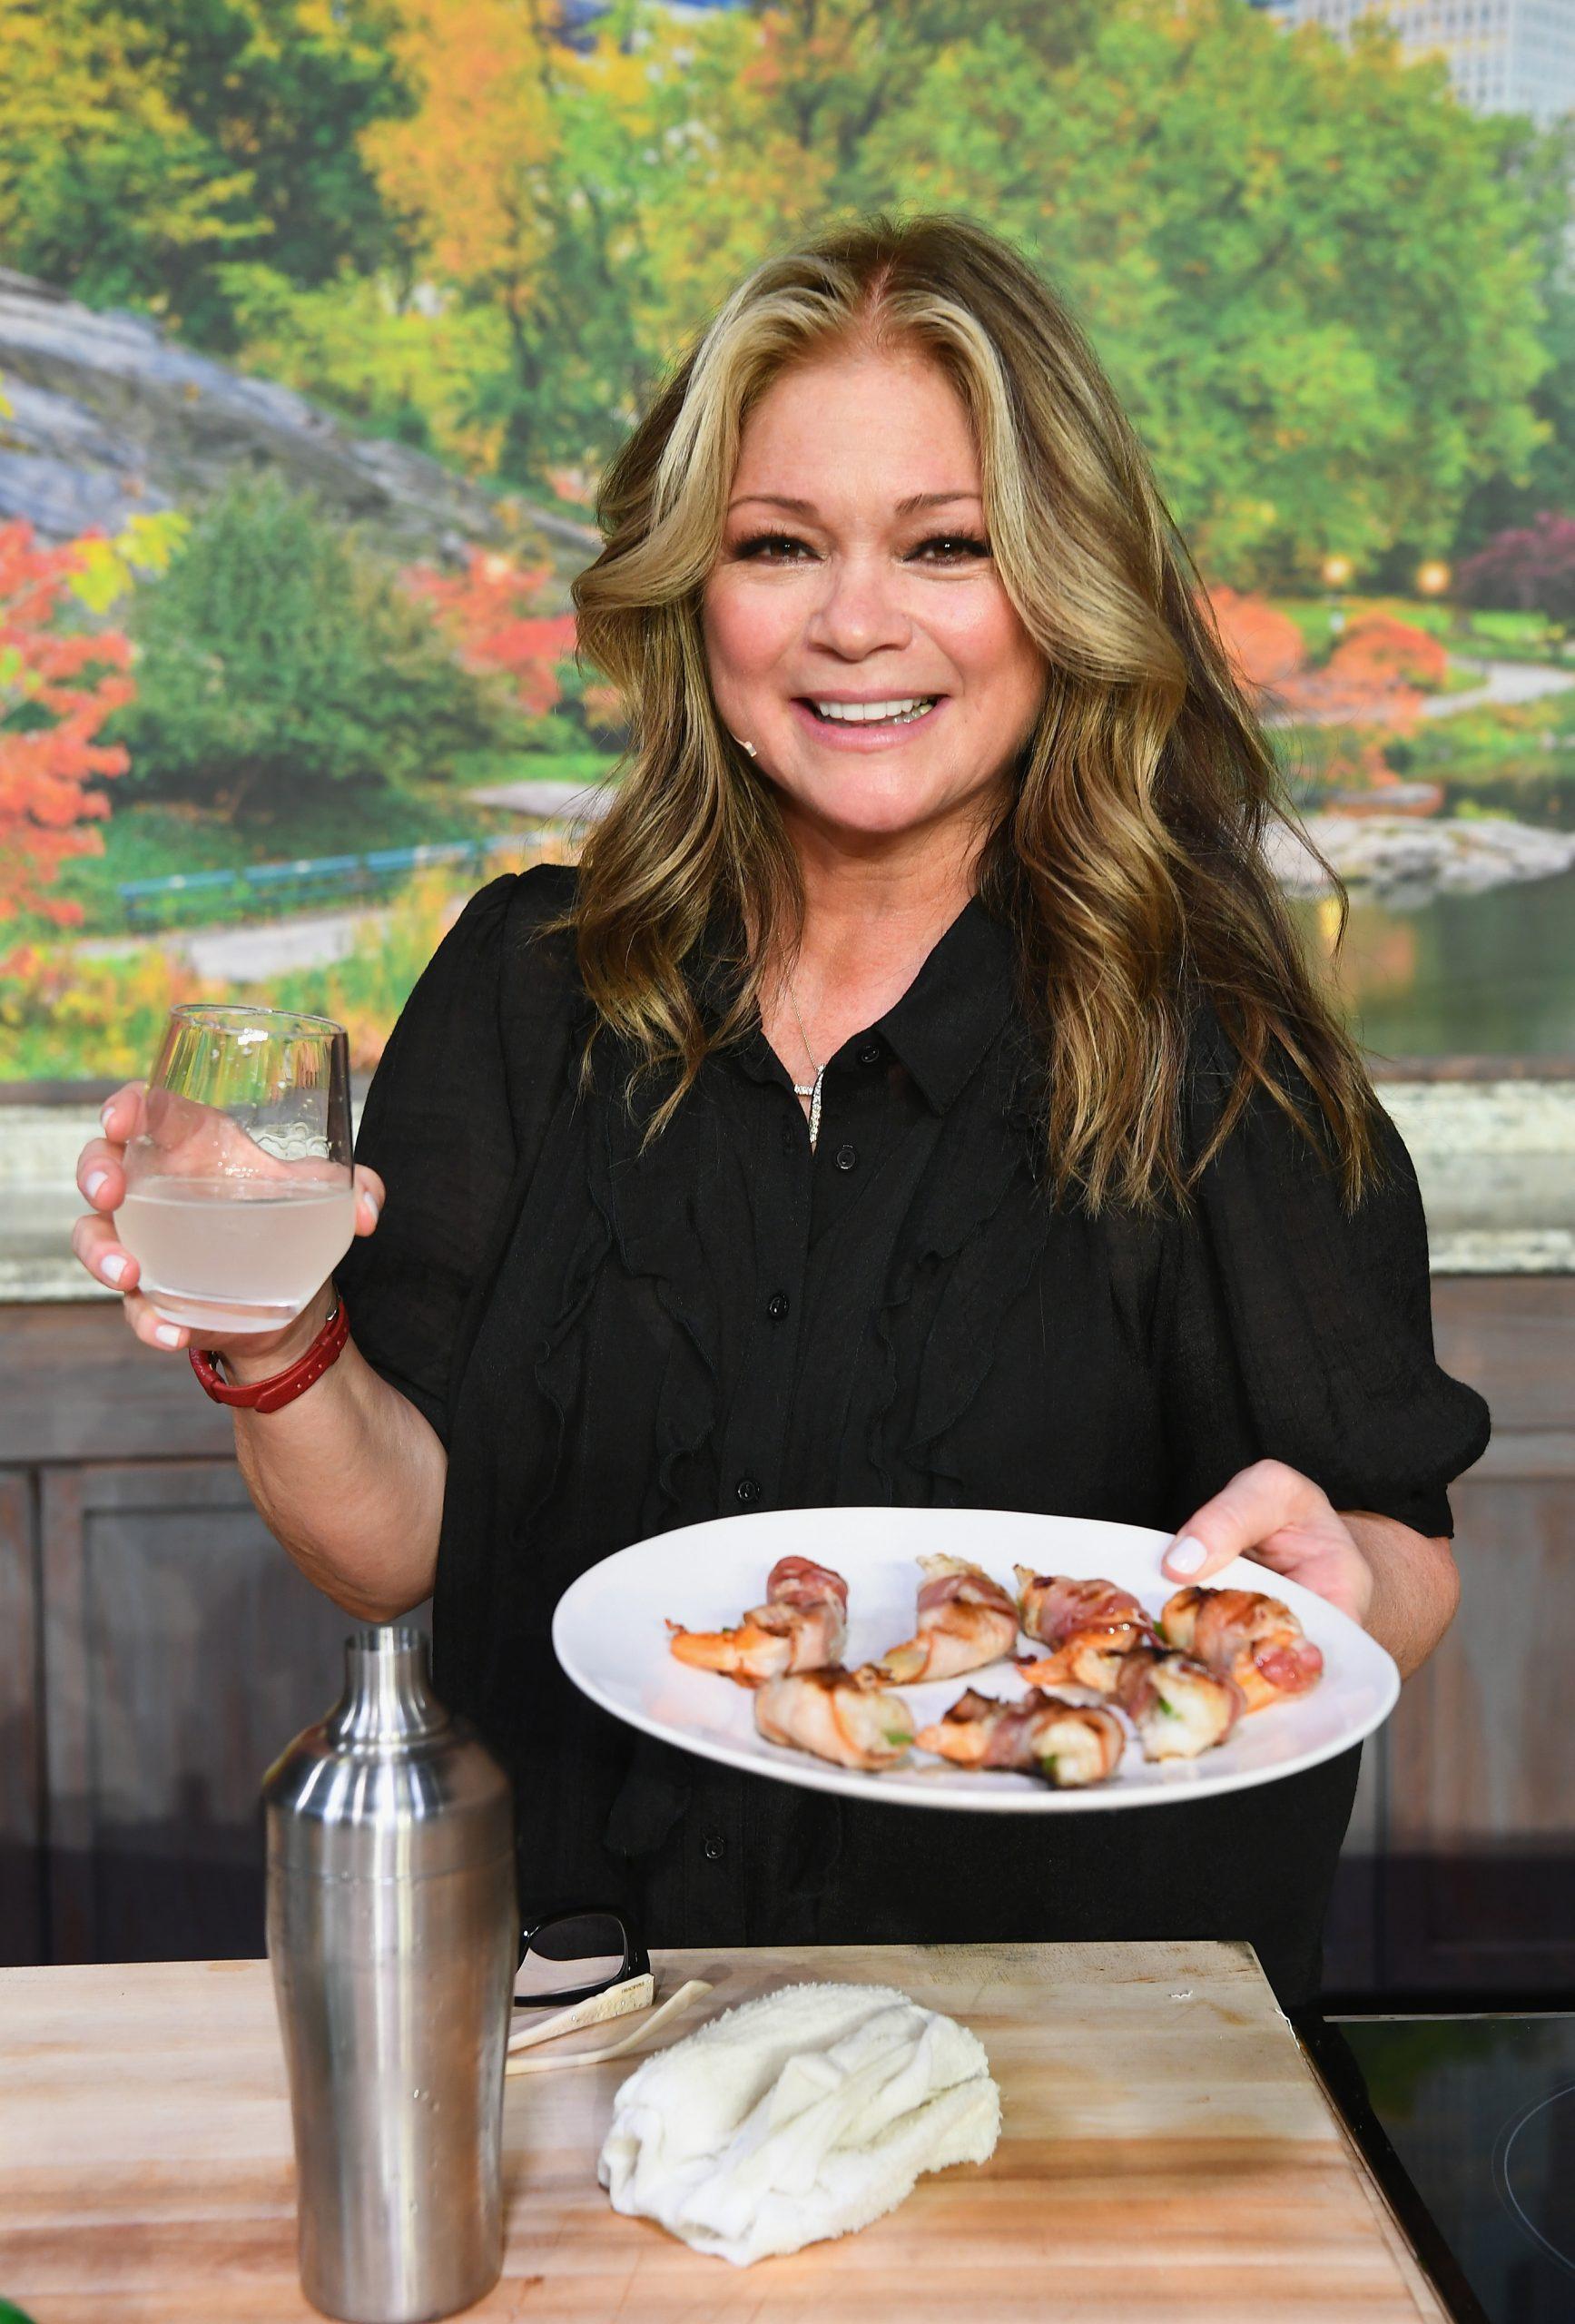 Food Network star Valerie Bertinelli